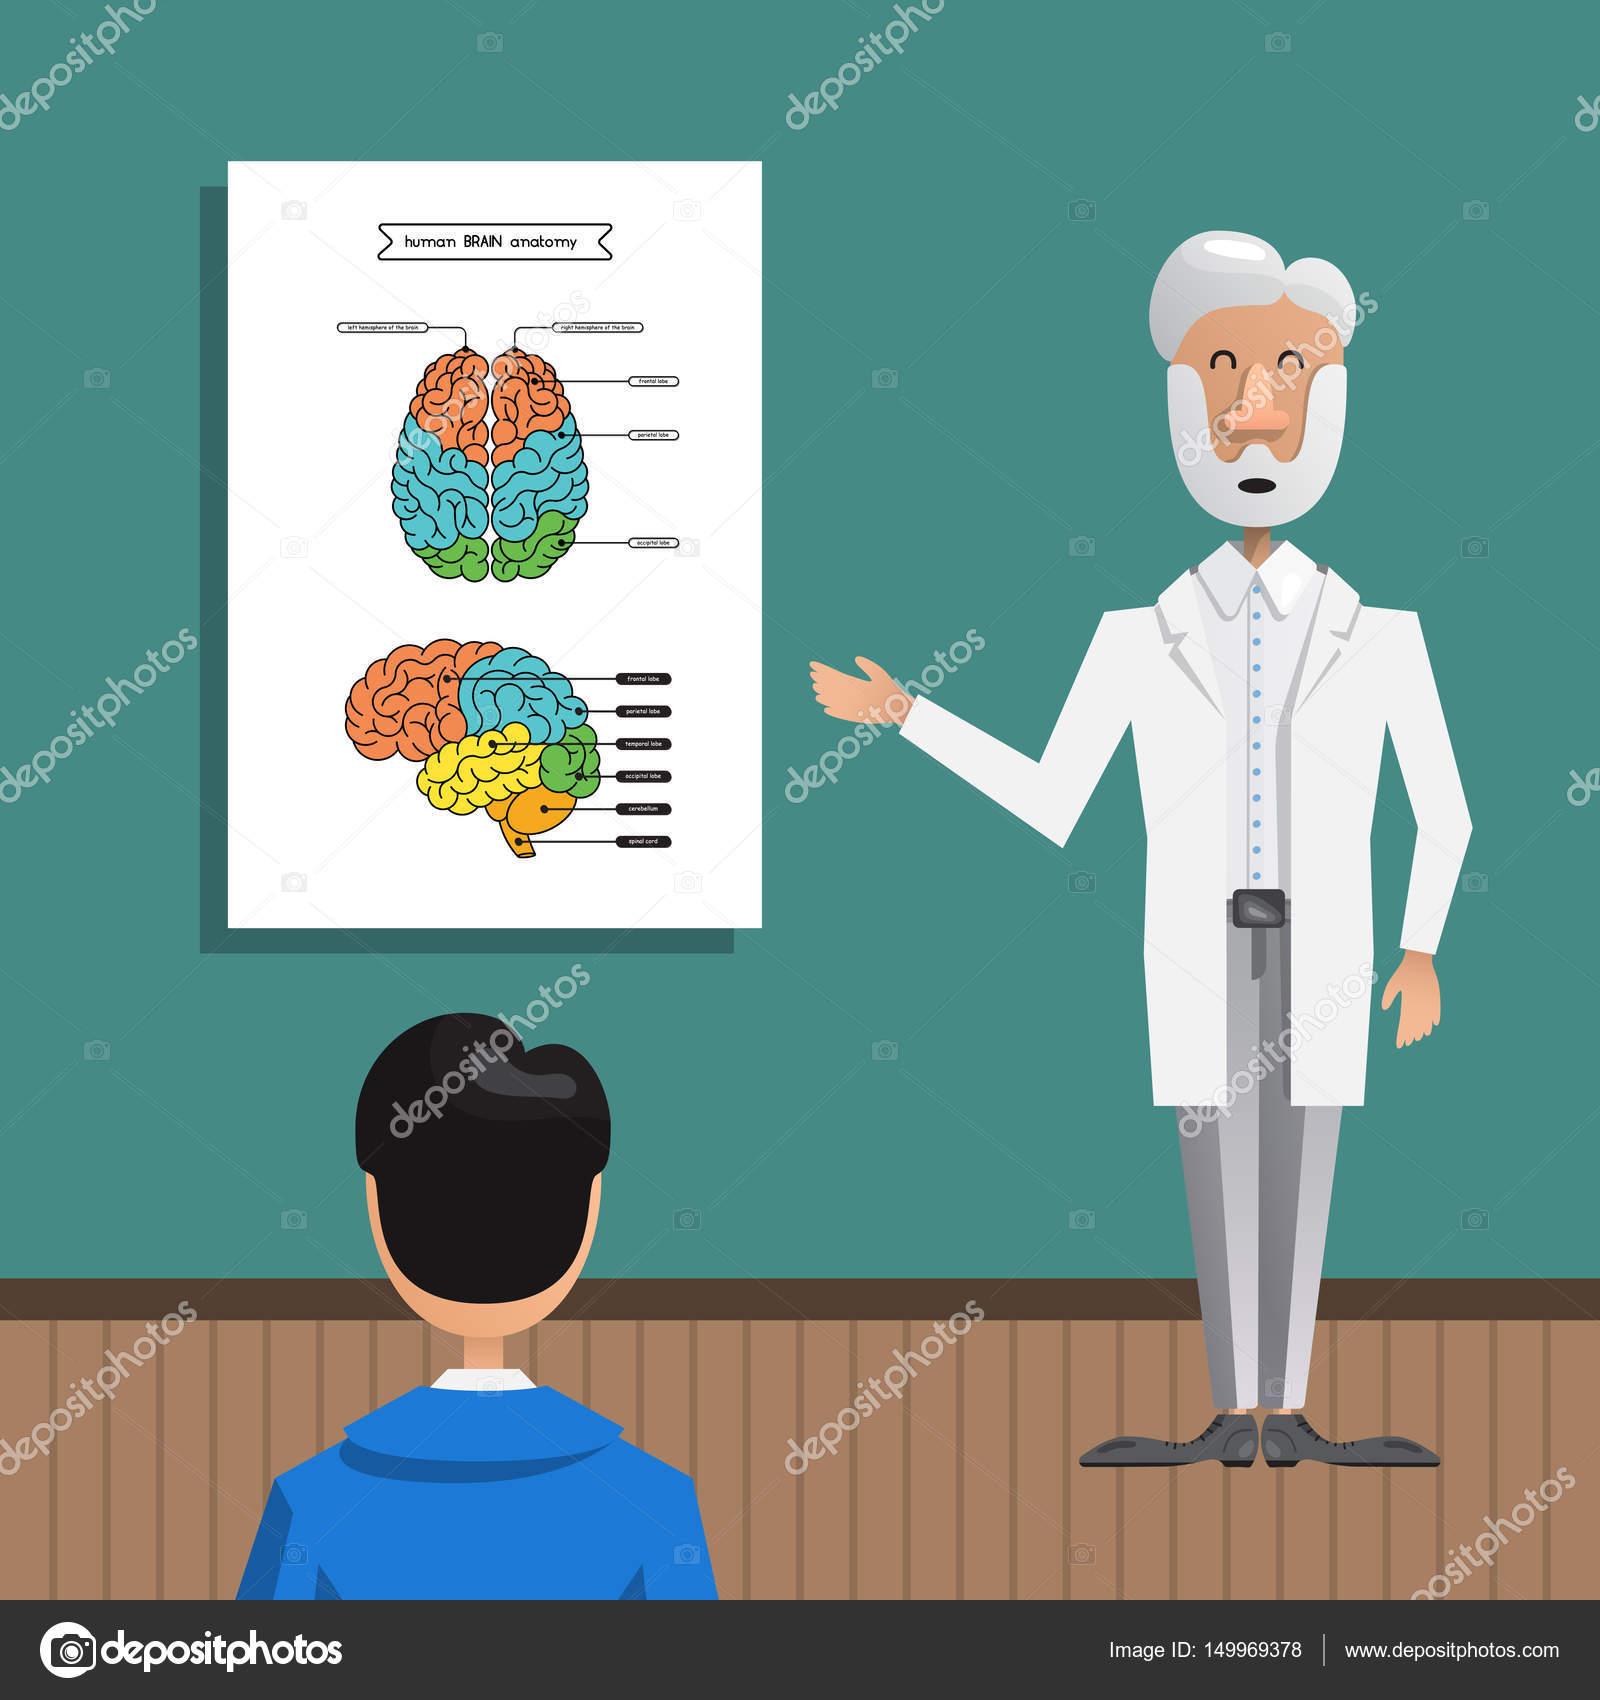 Struktur und Anatomie Gehirn — Stockvektor © shopplaywood #149969378